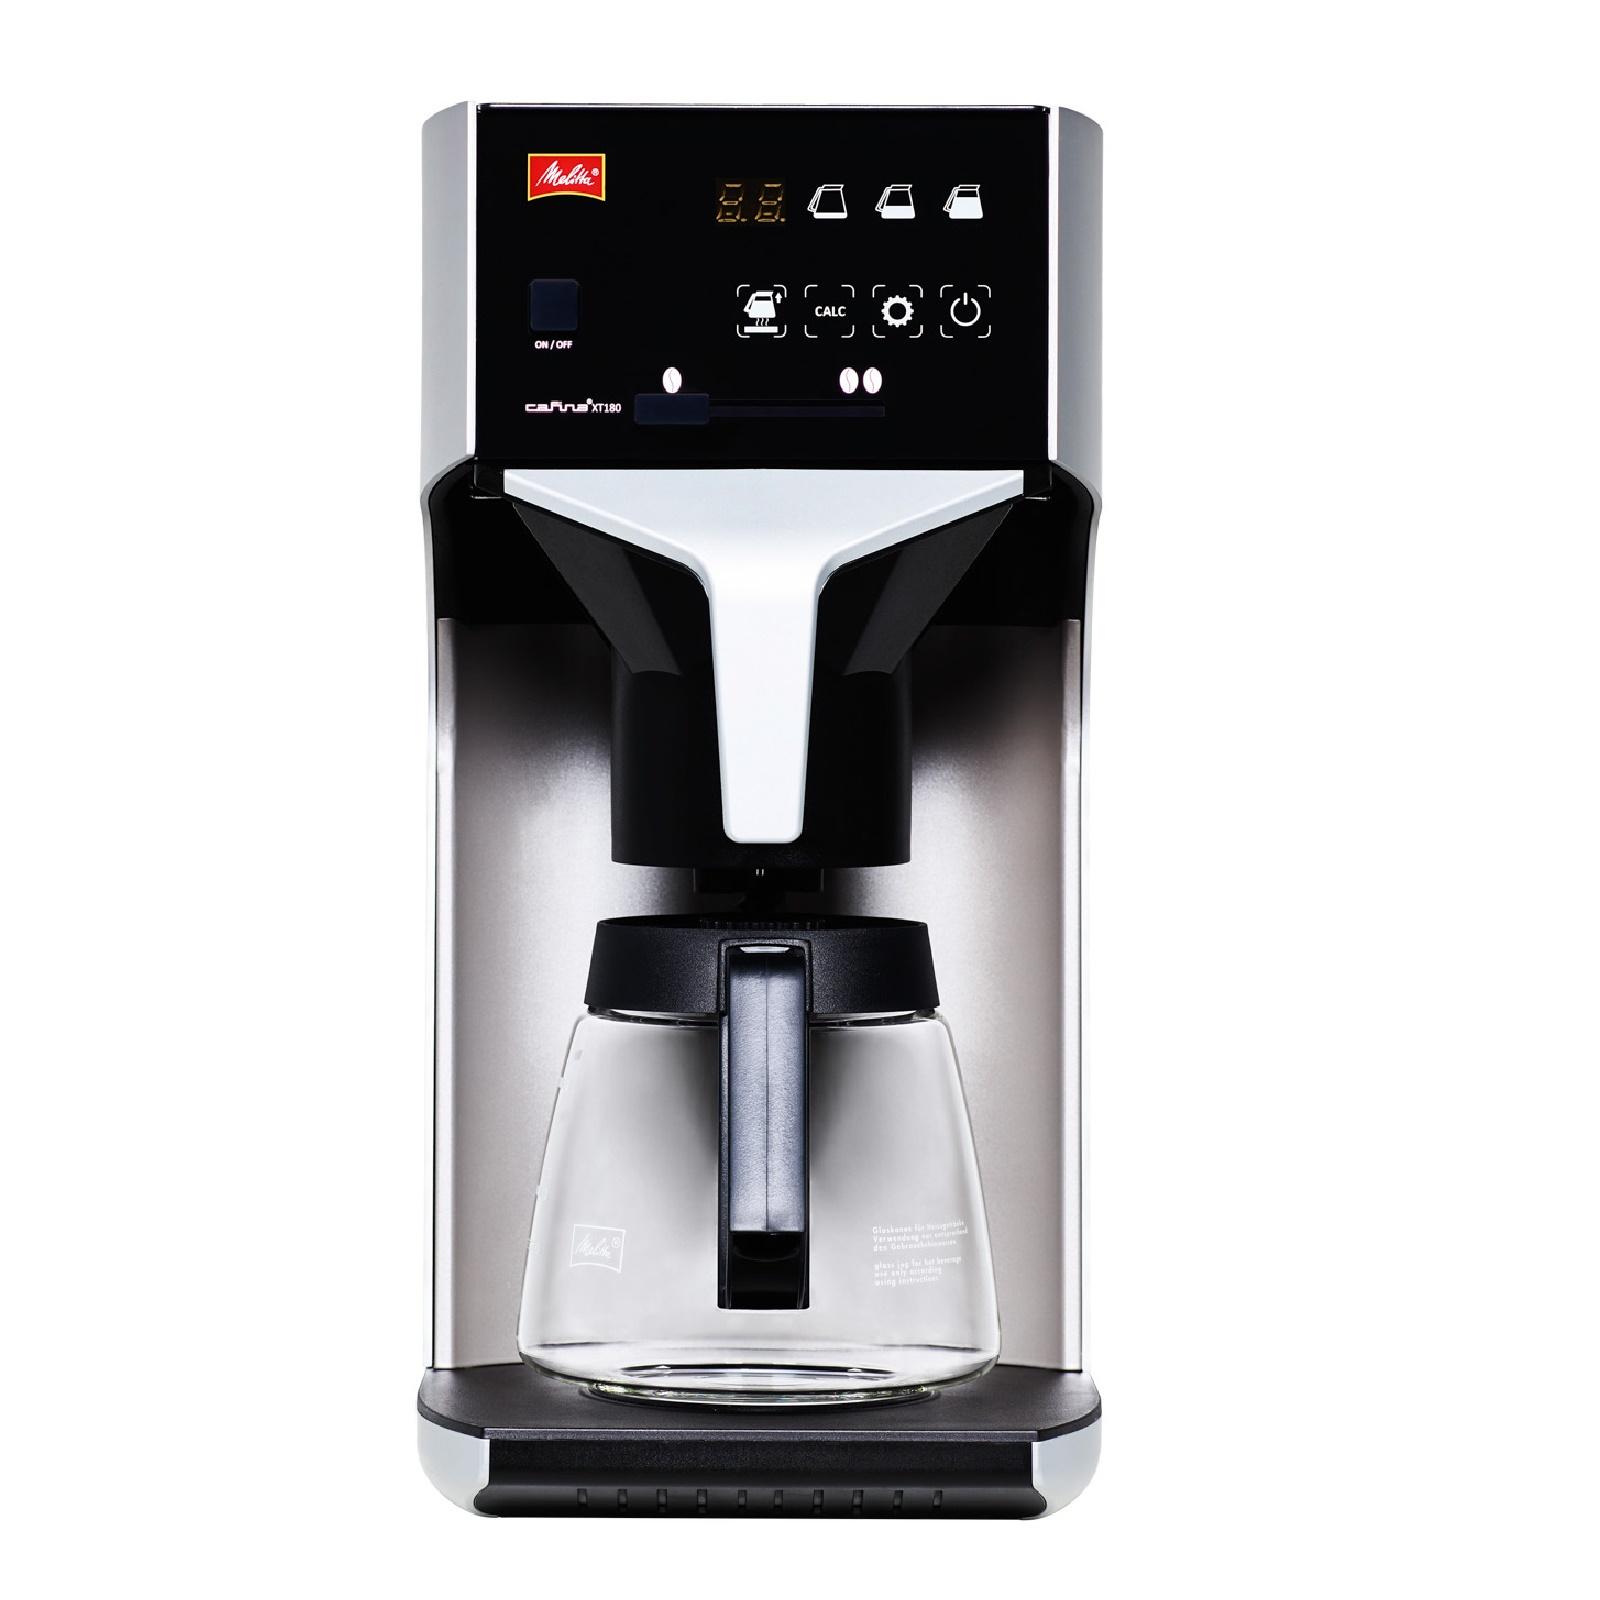 melitta cafina xt180 gmc kaffeemaschine o festwasseranschluss mit glaskanne. Black Bedroom Furniture Sets. Home Design Ideas